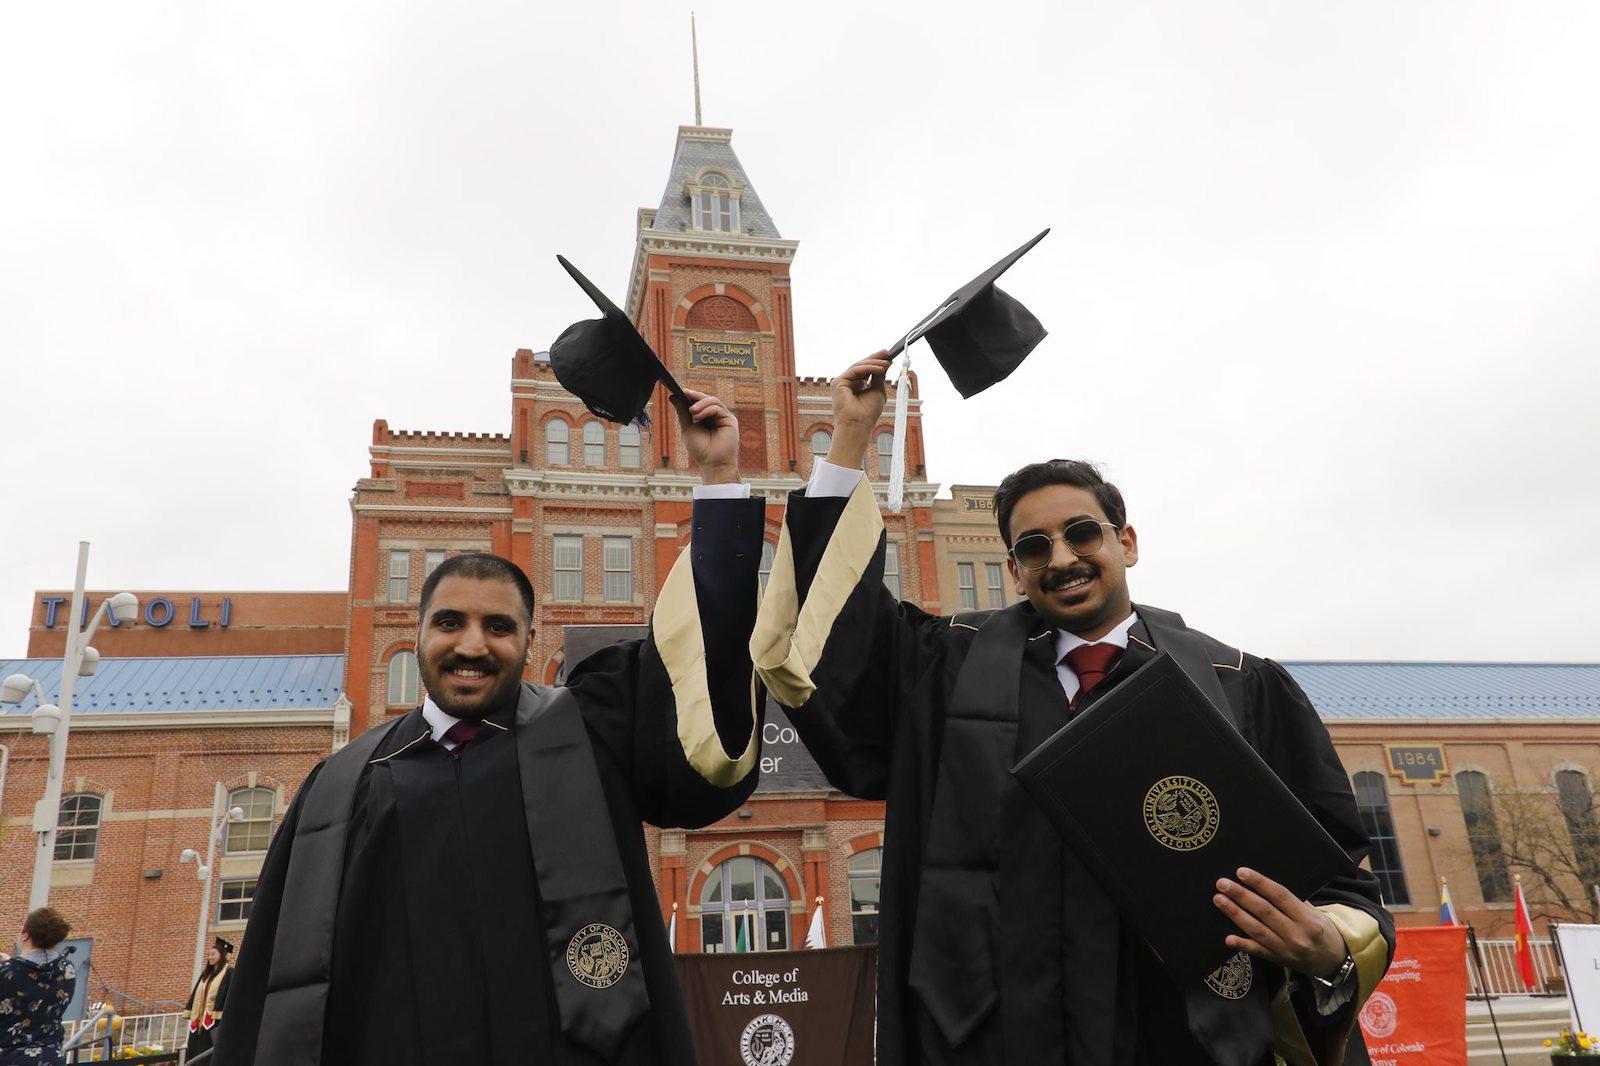 Graduates holding graduation caps